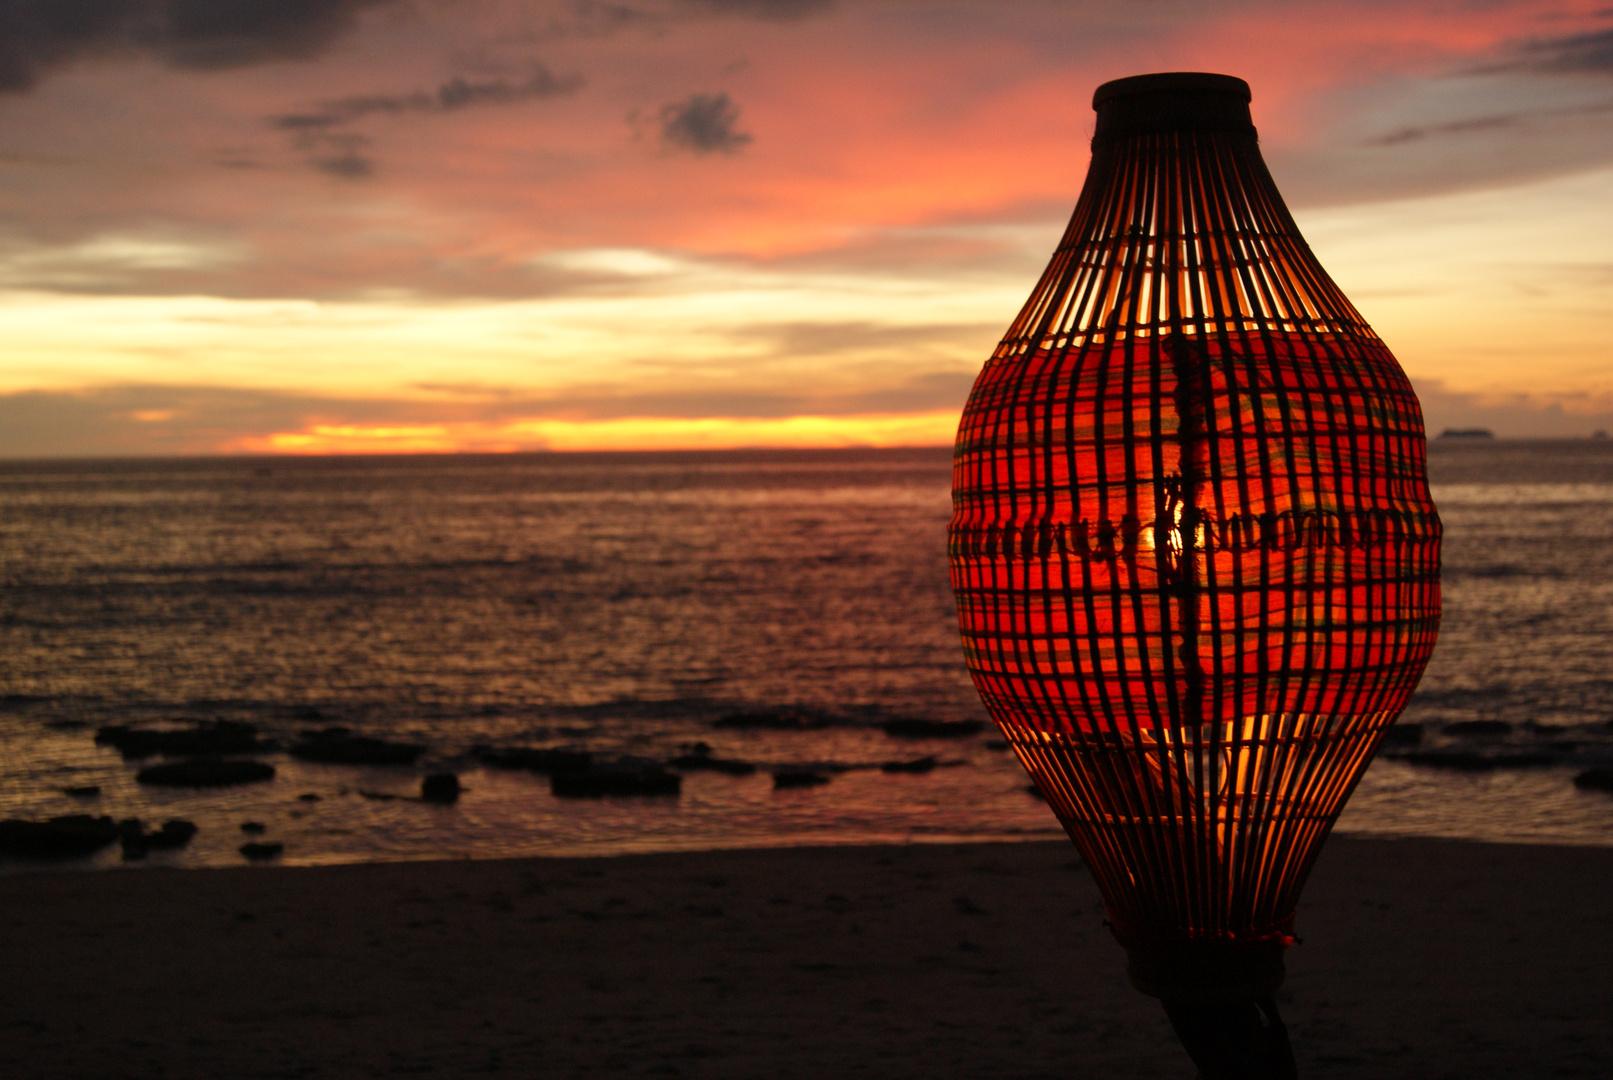 Sonnenuntergang mit Lampe